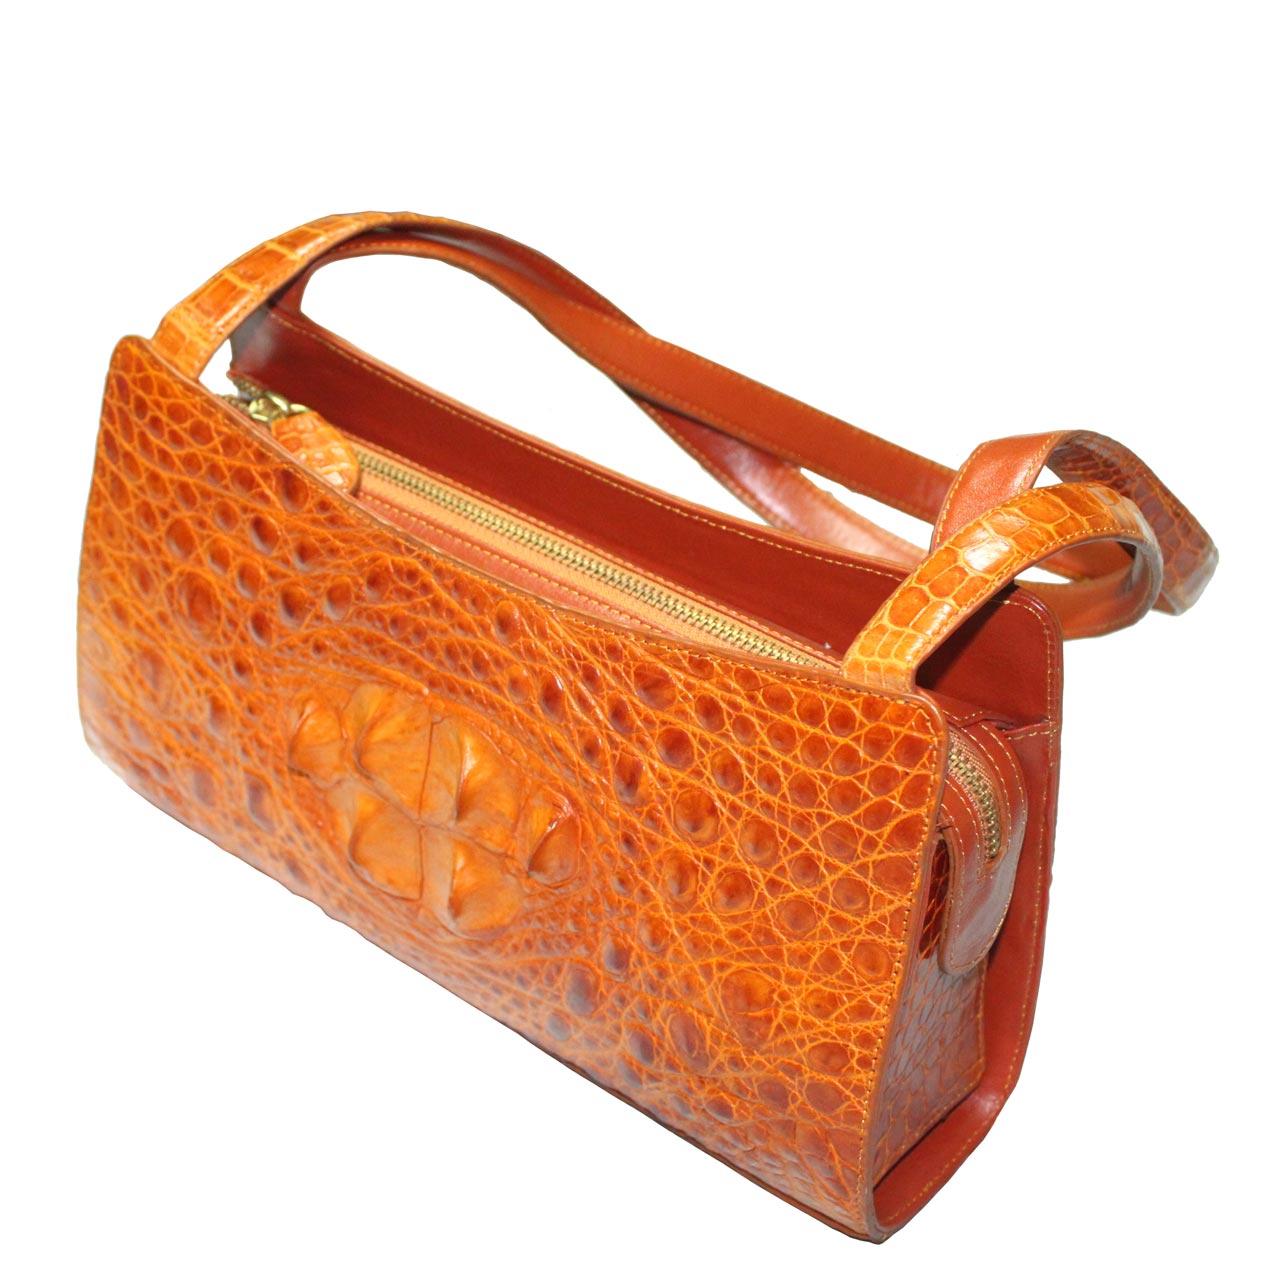 Crocodile Leather Handbag S026b